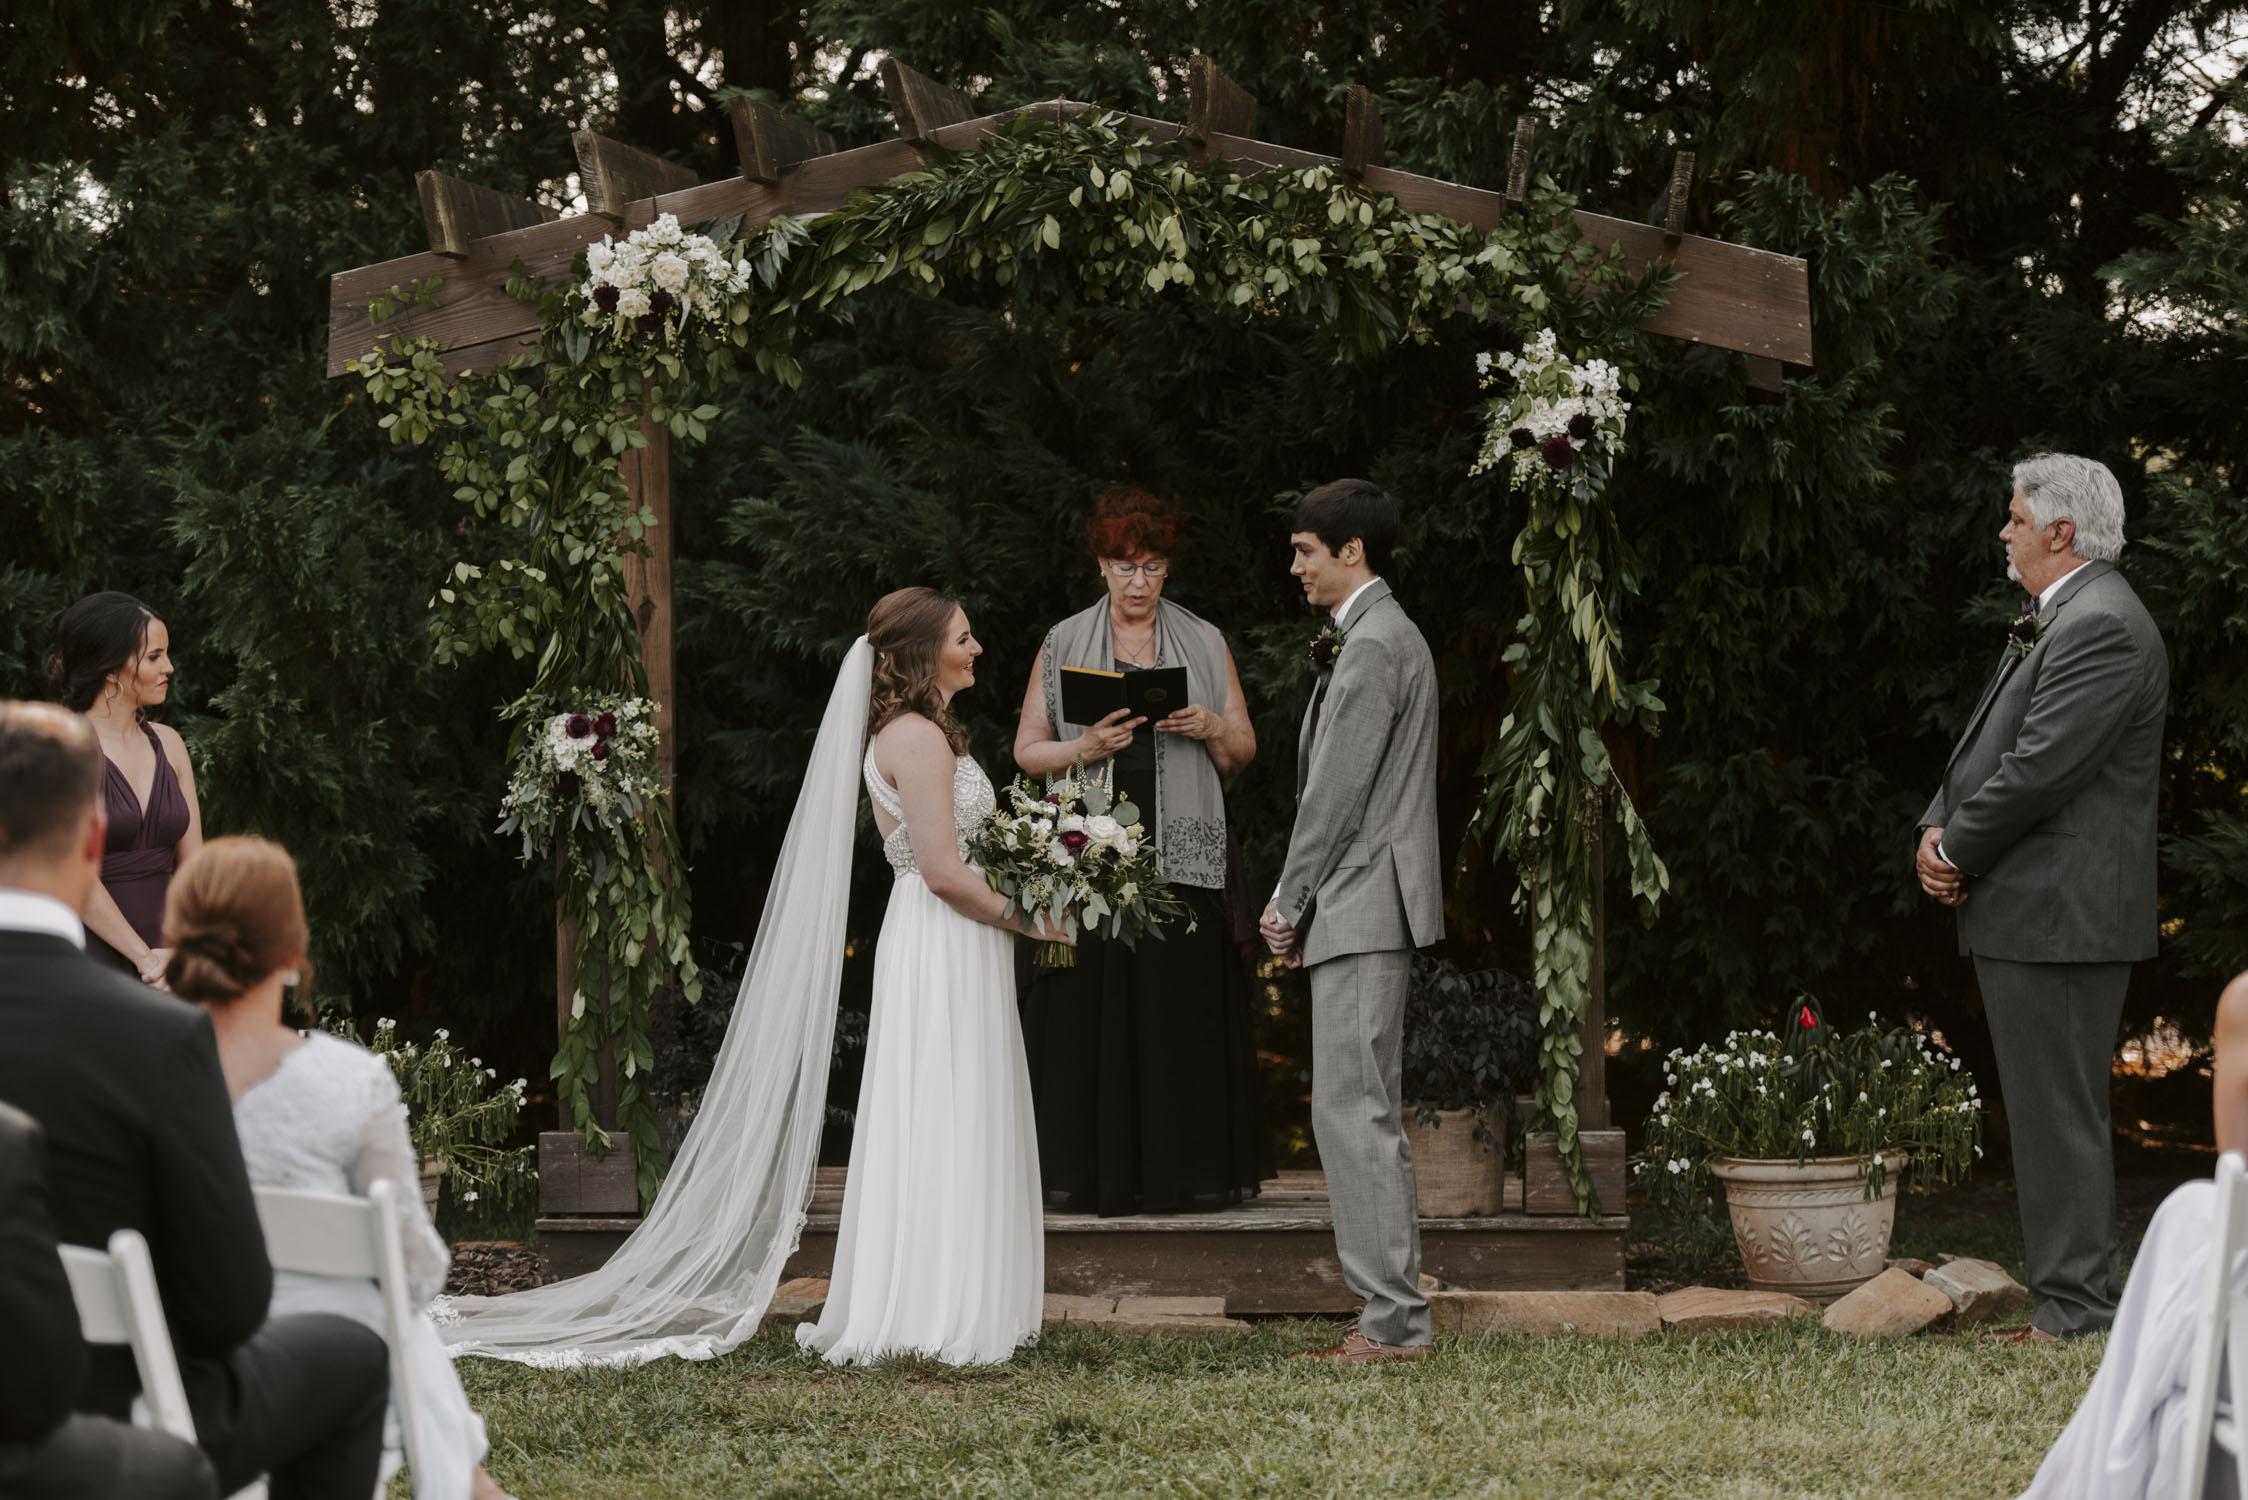 Chapel Hill Wedding getting ready photos | Kayli LaFon Photography, North Carolina Intimate Wedding Photographer